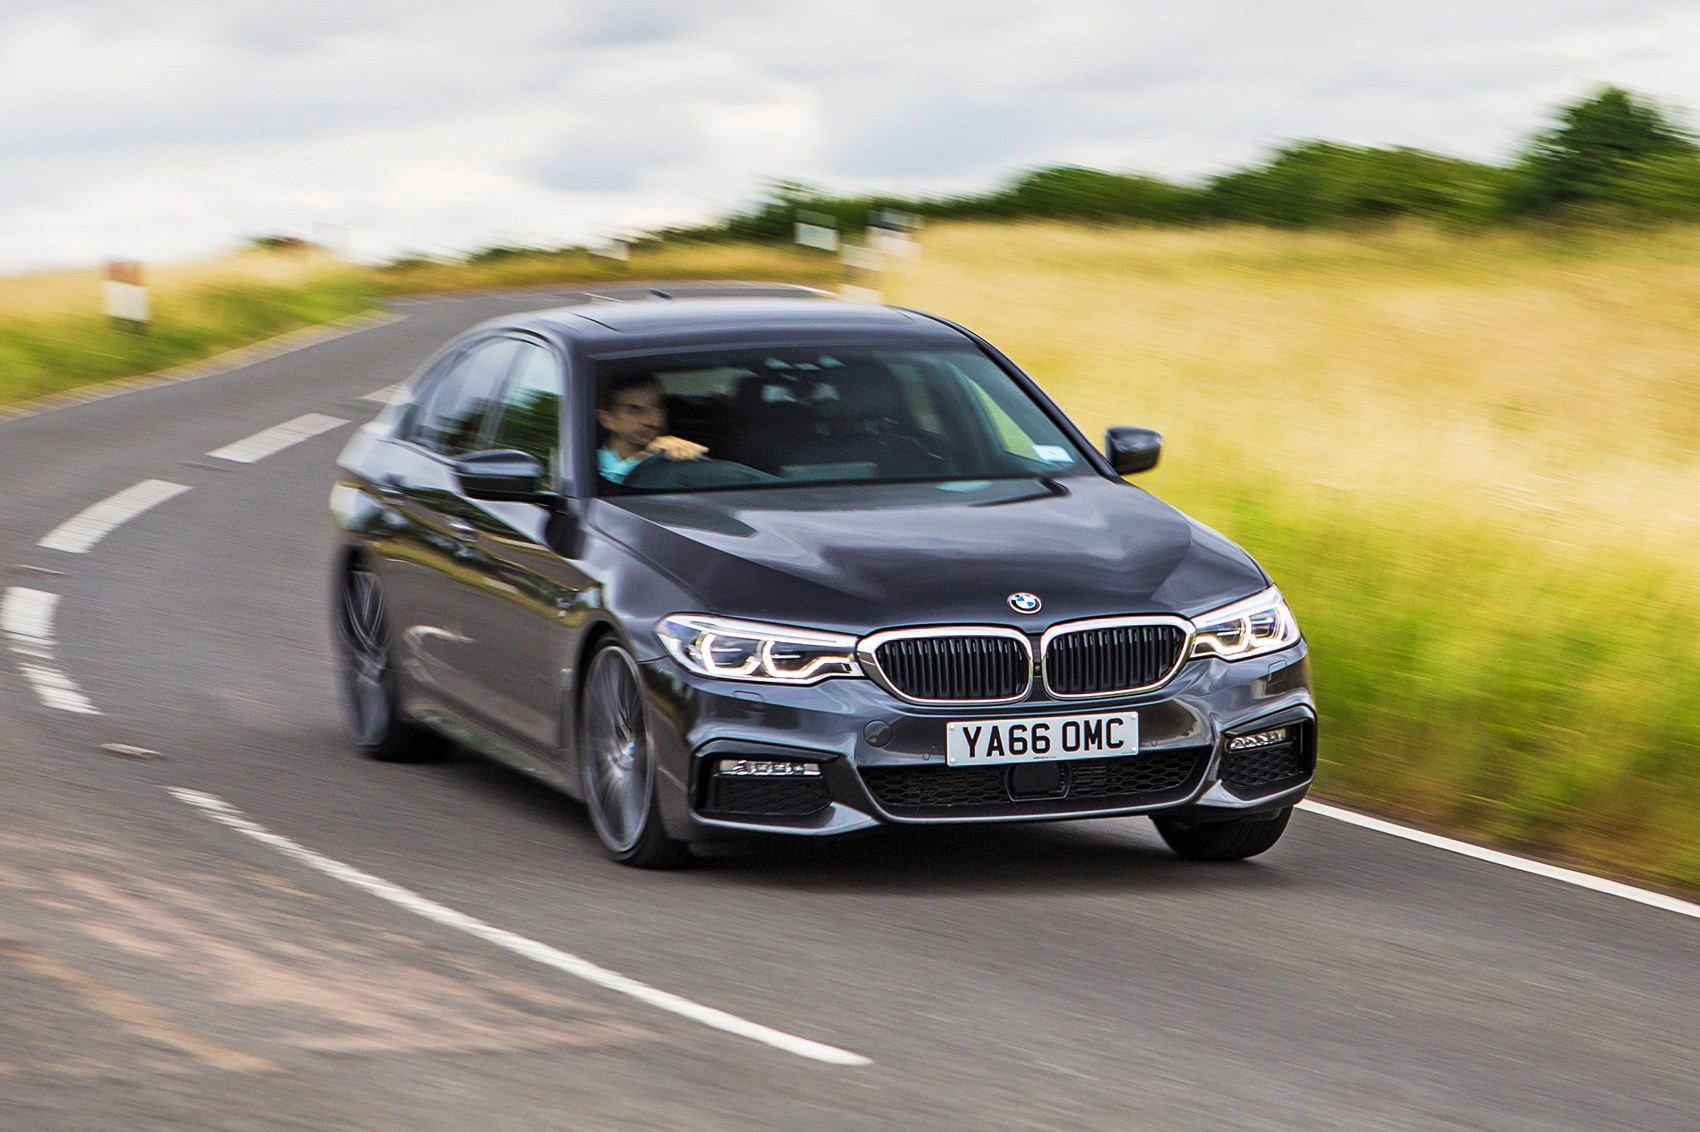 BMW 530d xDrive long-term review | CAR Magazine